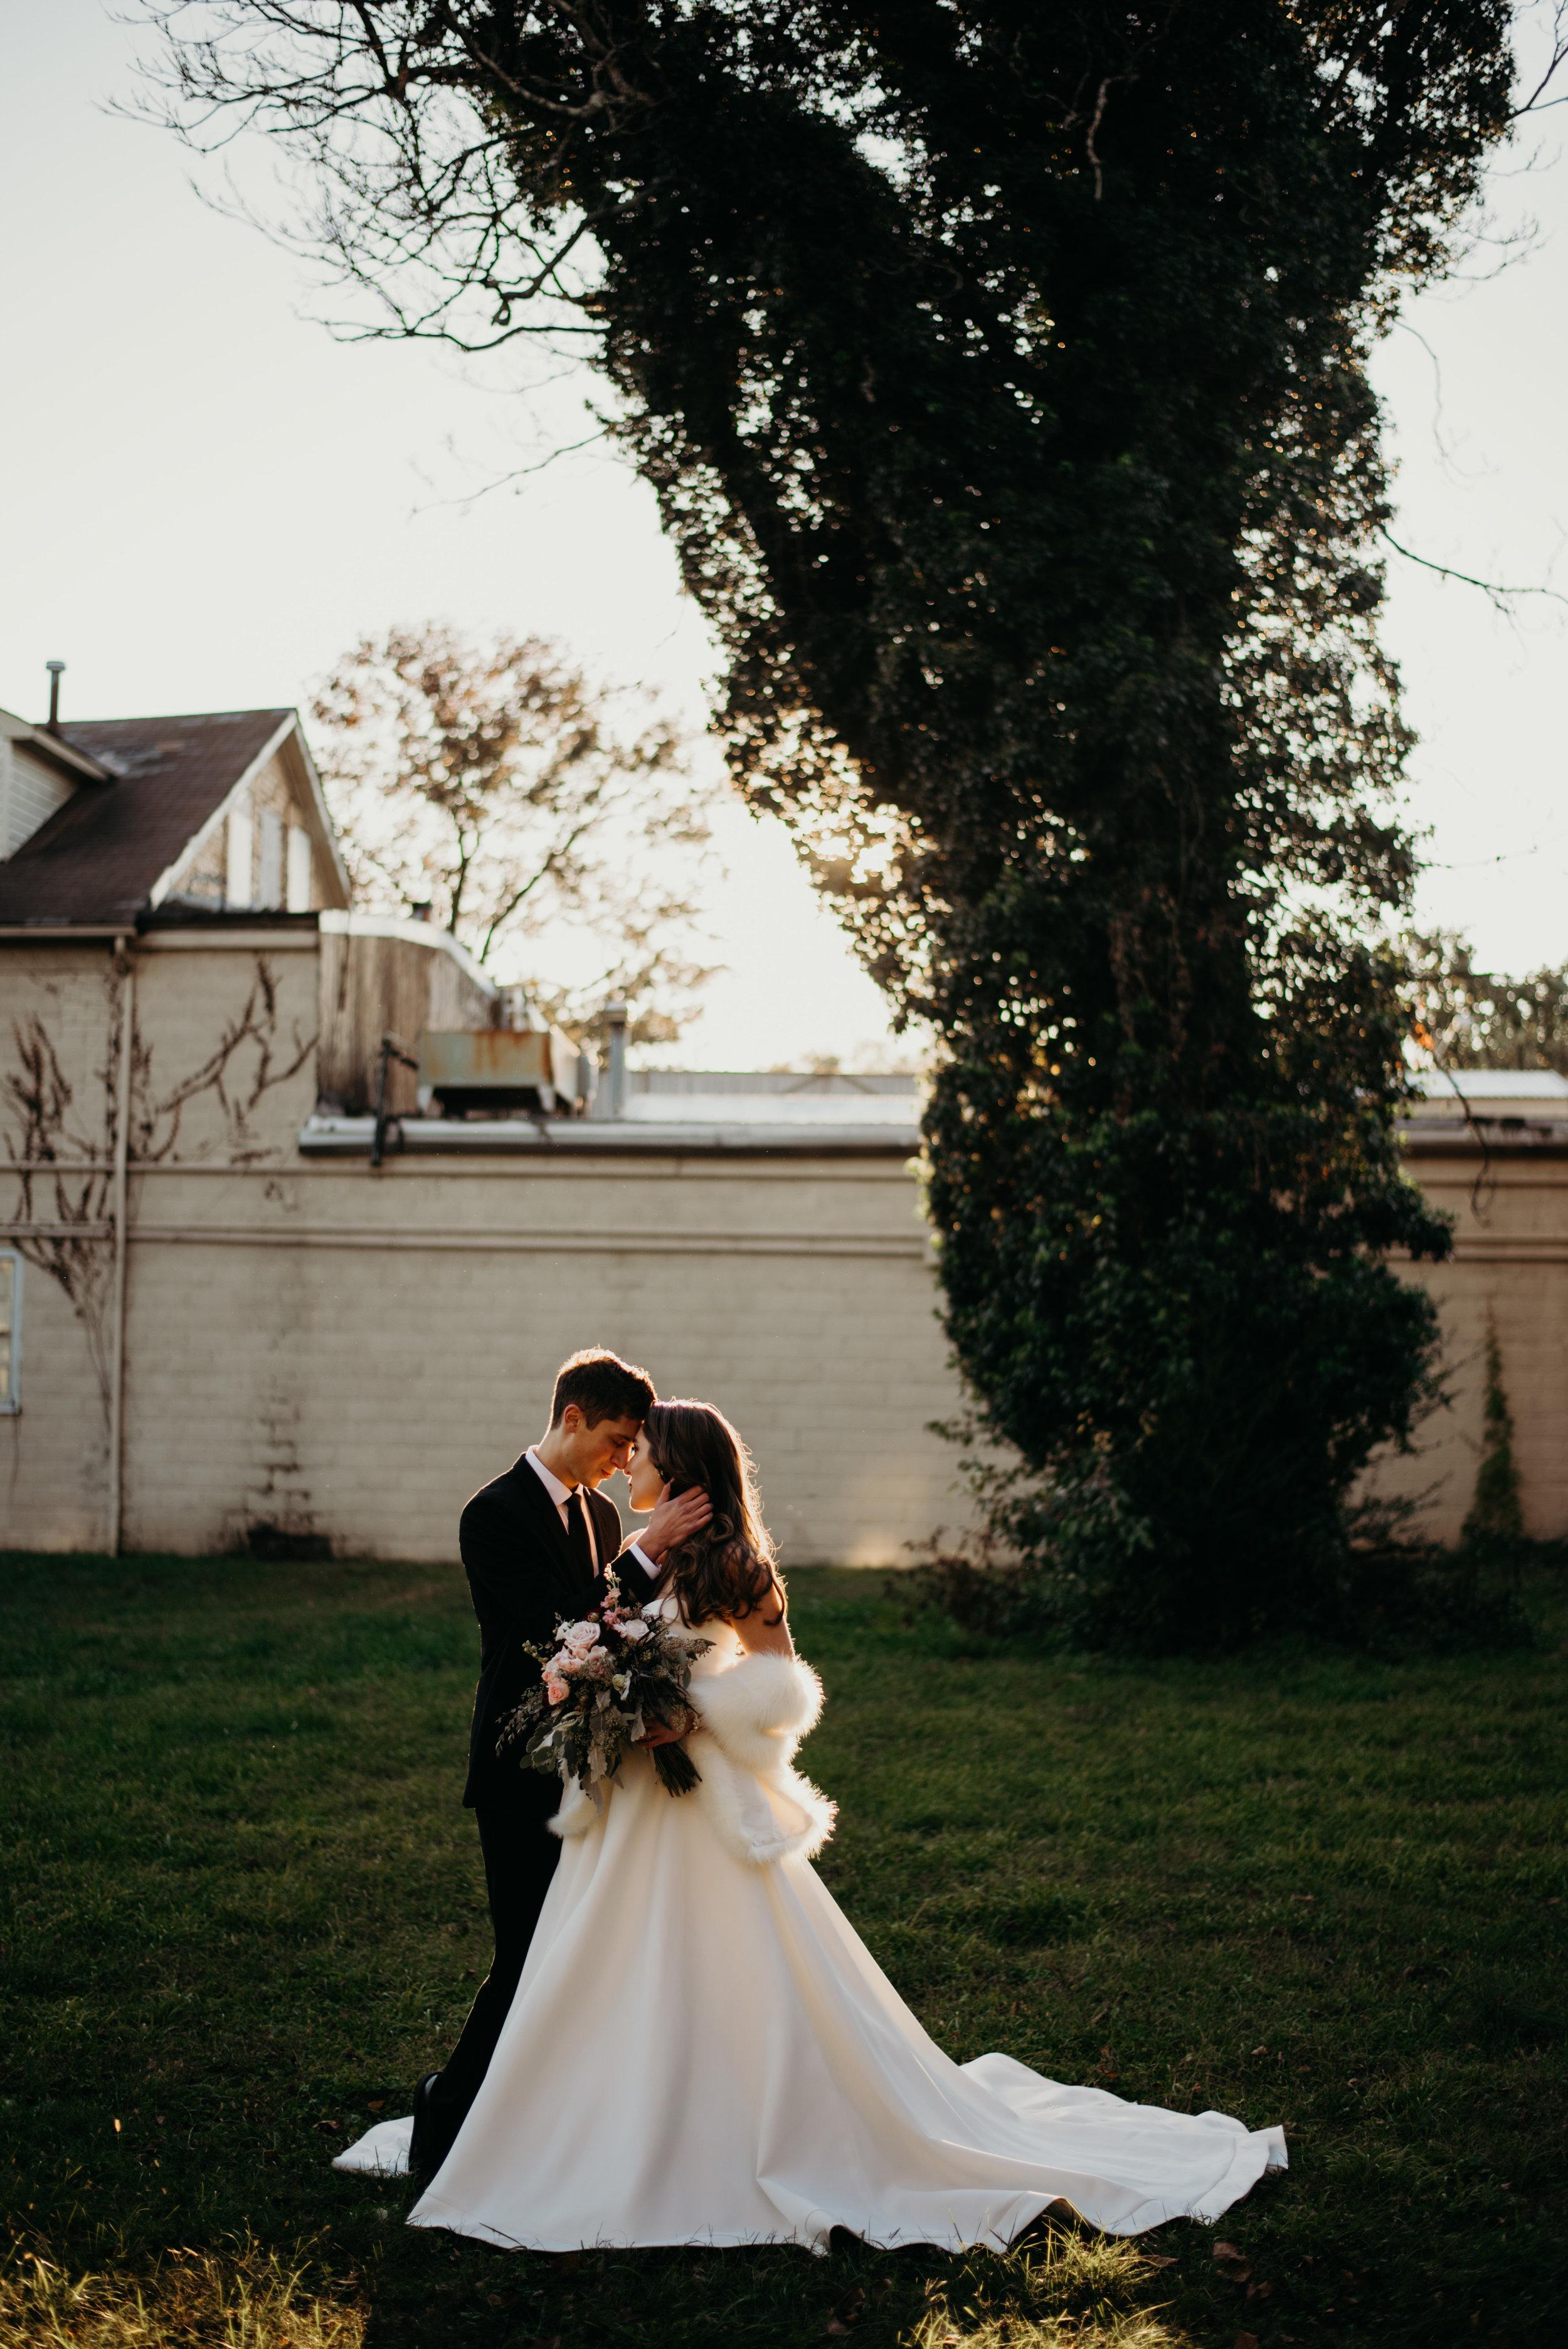 nathan-courtney-wedding-at-inn-at-the-silk-mill-fredericksburg-virginia-lindsey-paradiso-photography-3852.jpg